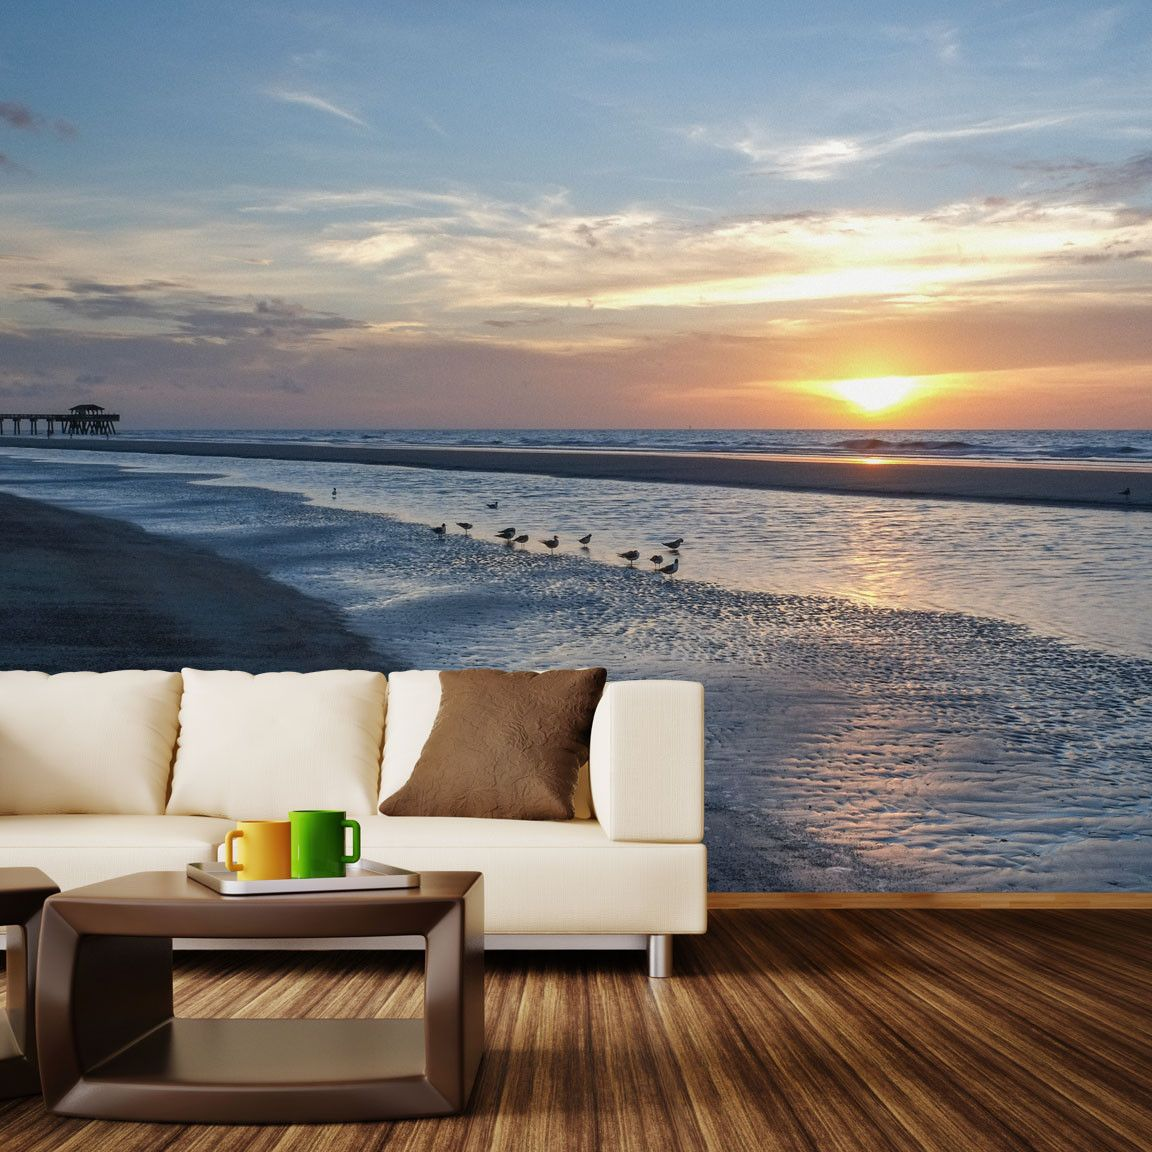 13+ Outdoor wall beach decor ideas in 2021